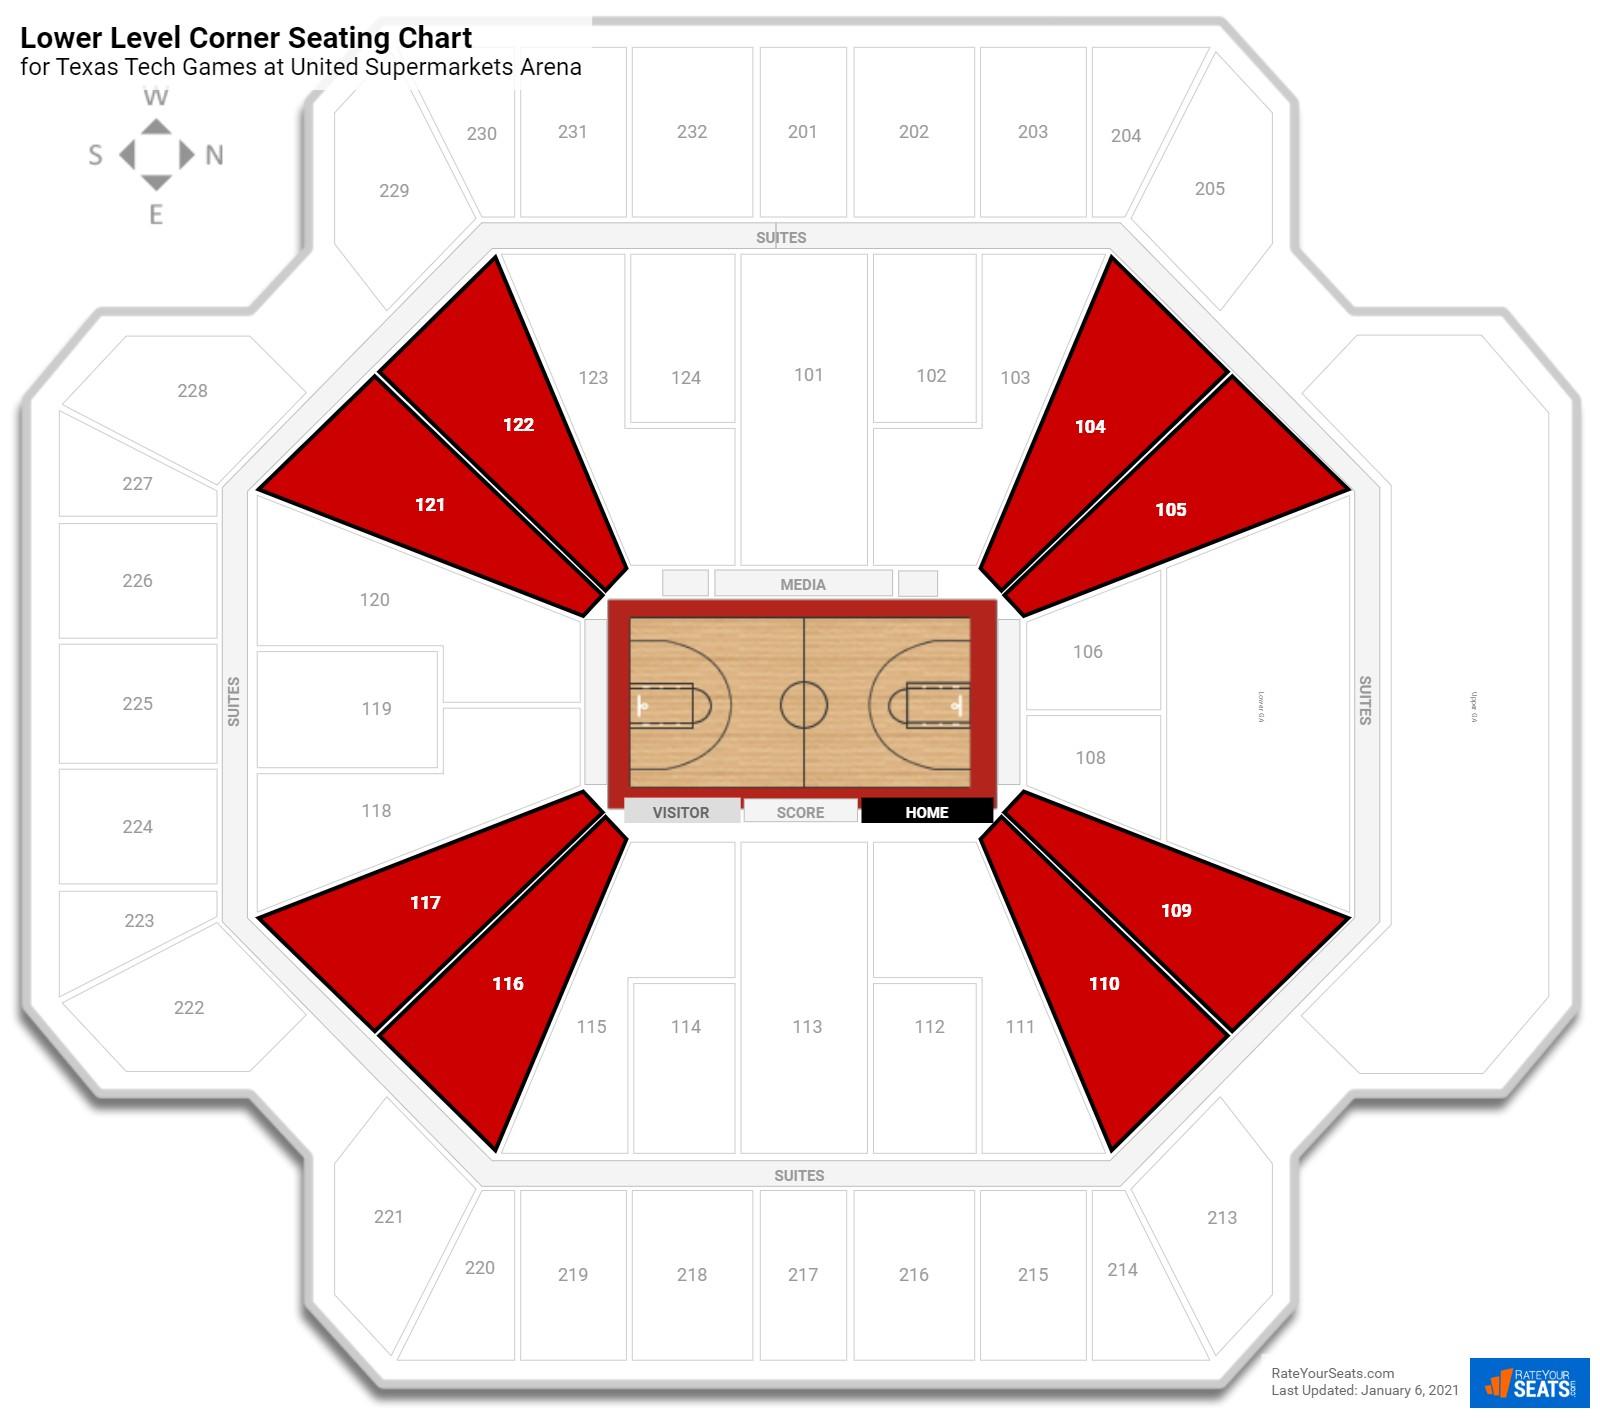 United Supermarkets Arena Lower Level Corner Seating Chart